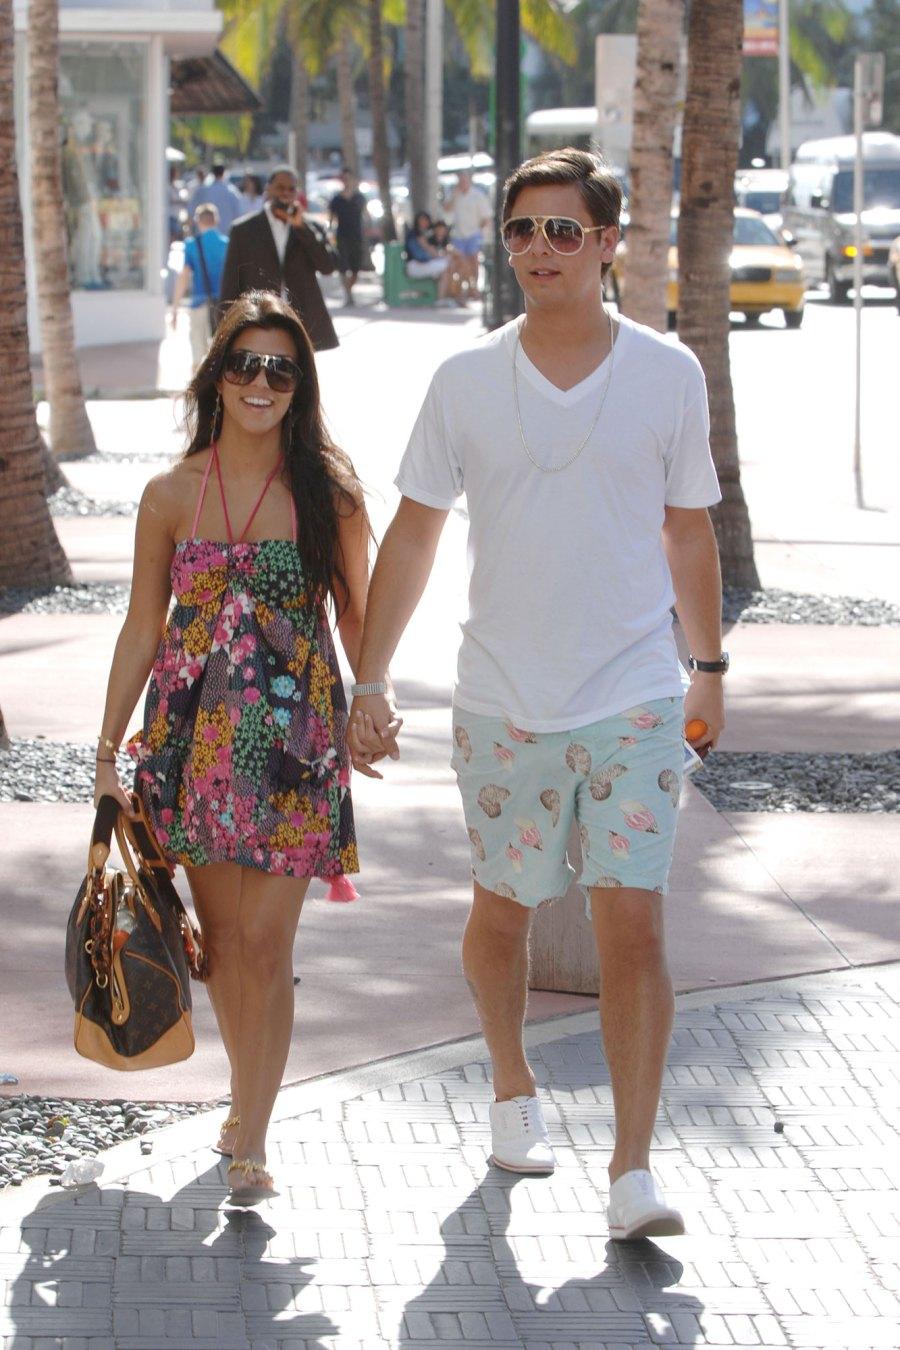 Kourtney Kardashian and Scott Disick's Relationship Timeline